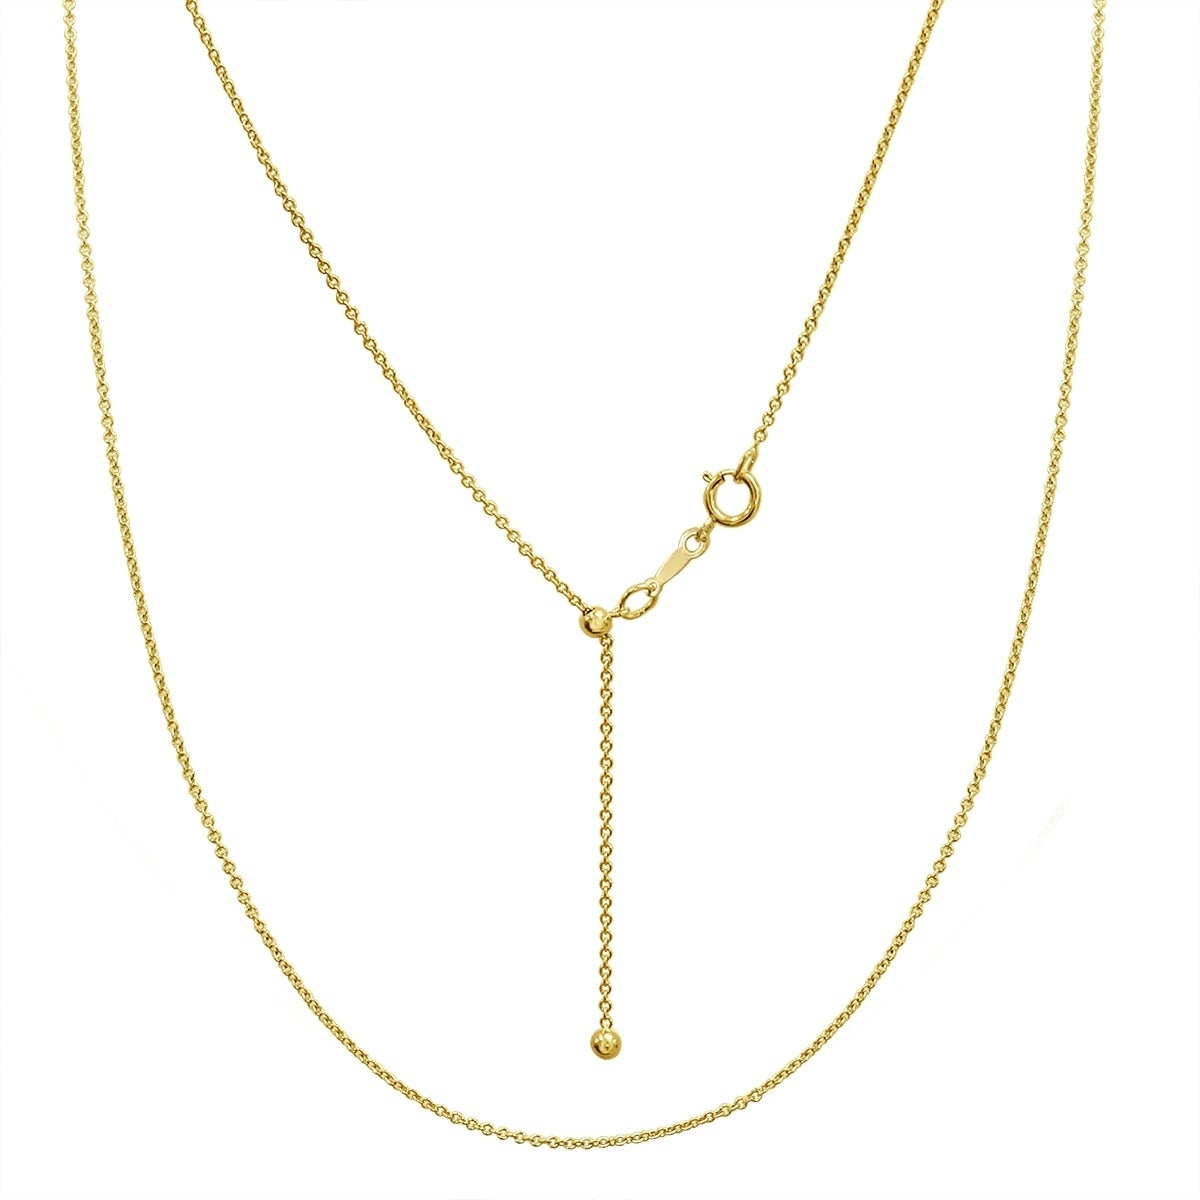 DiamondJewelryNY 14kt Gold Filled 5-Way//Special Needs Pendant